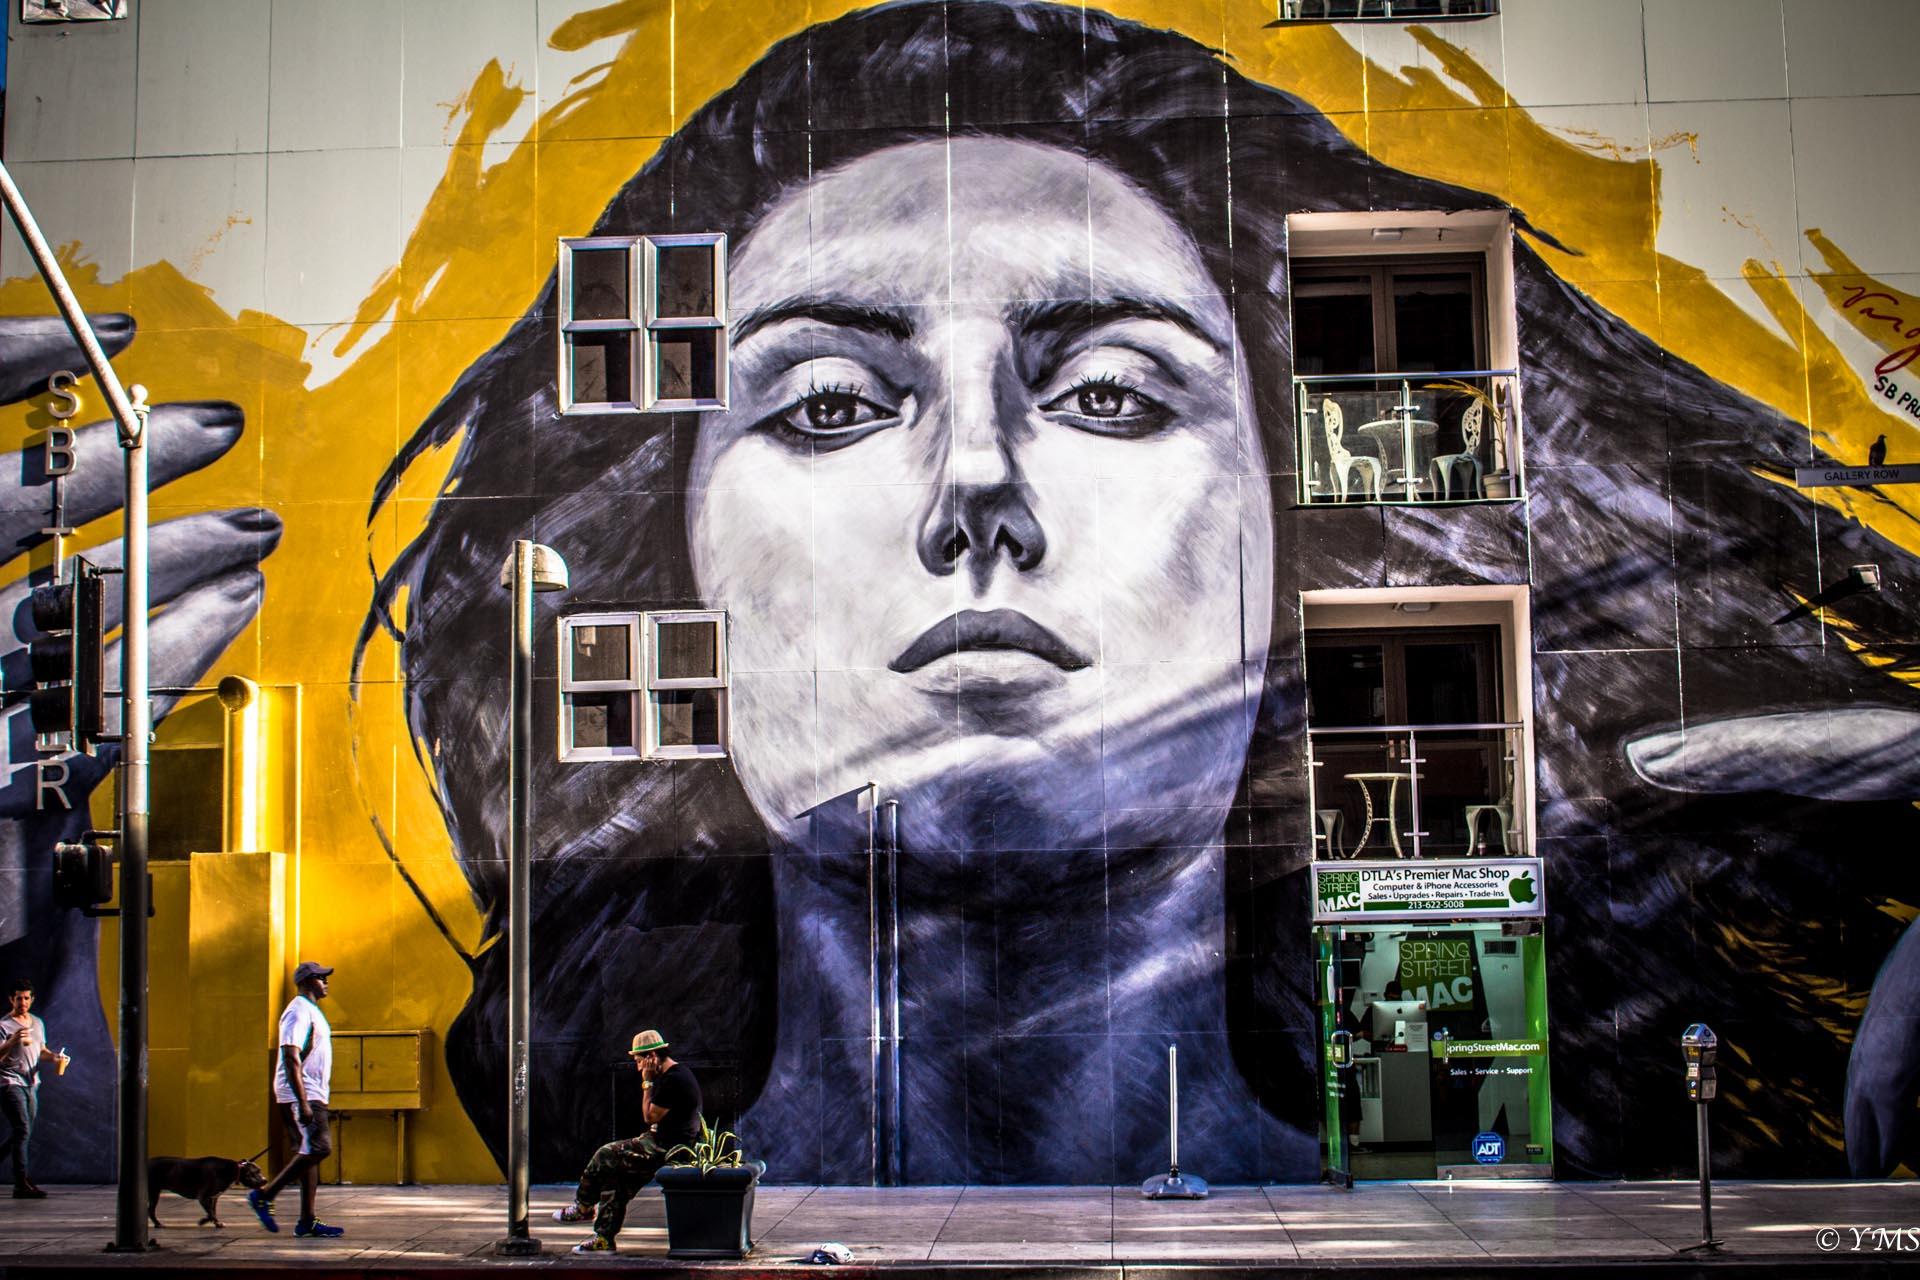 LA - Face Wall